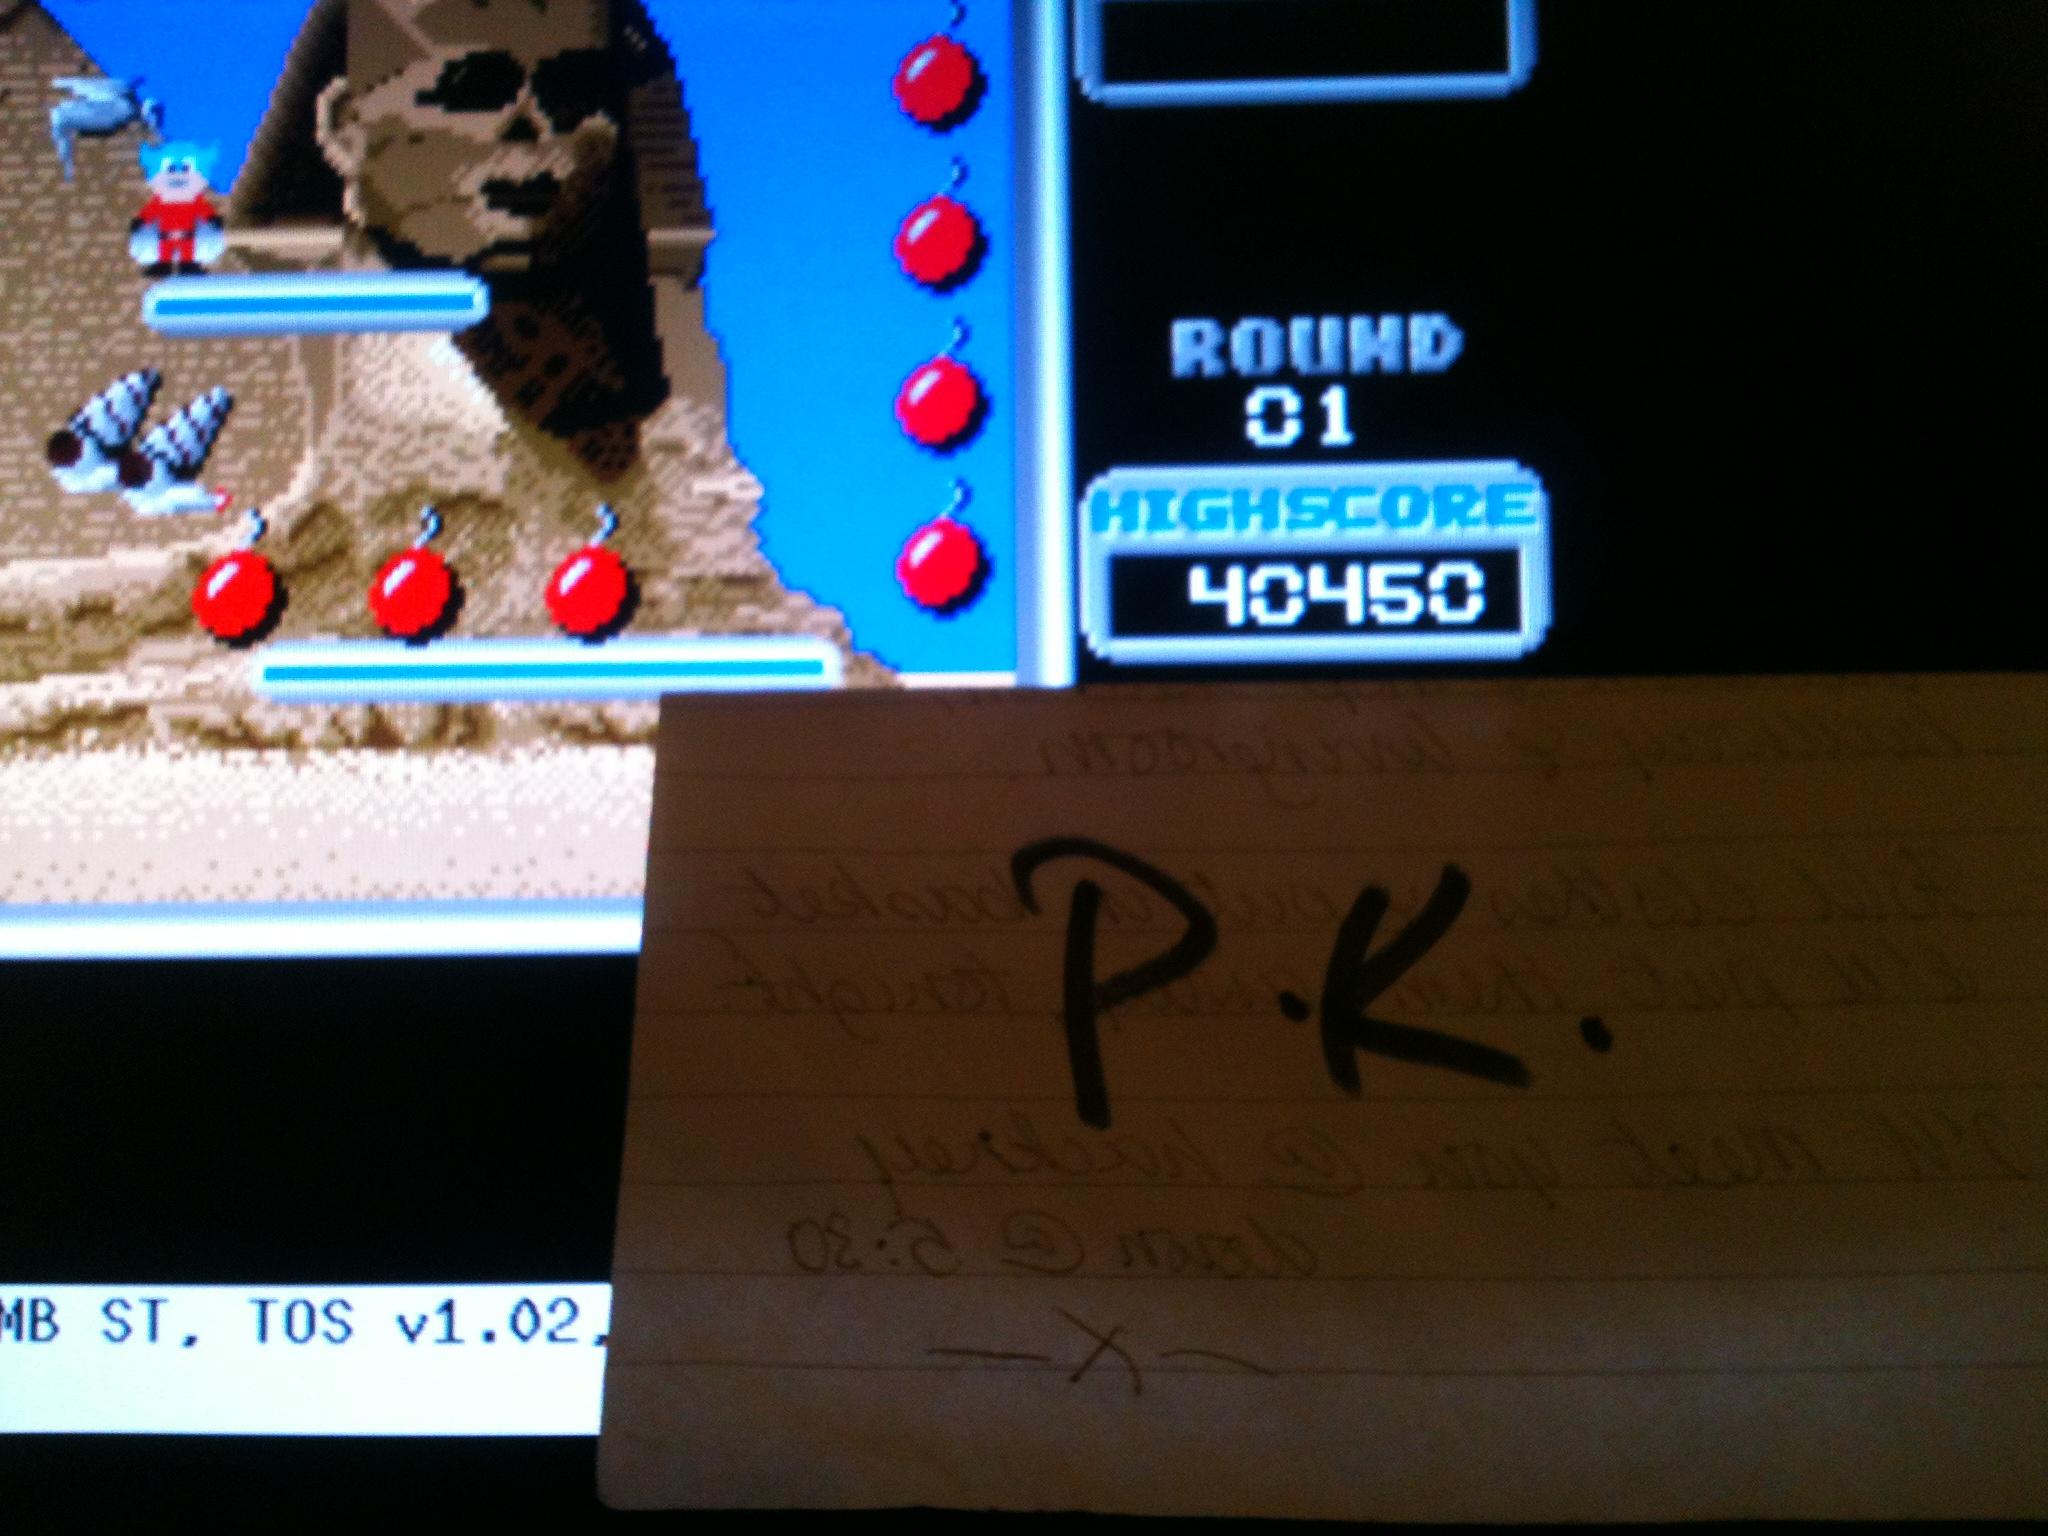 kernzy: Bomb Jack (Atari ST Emulated) 40,450 points on 2015-03-12 14:17:39